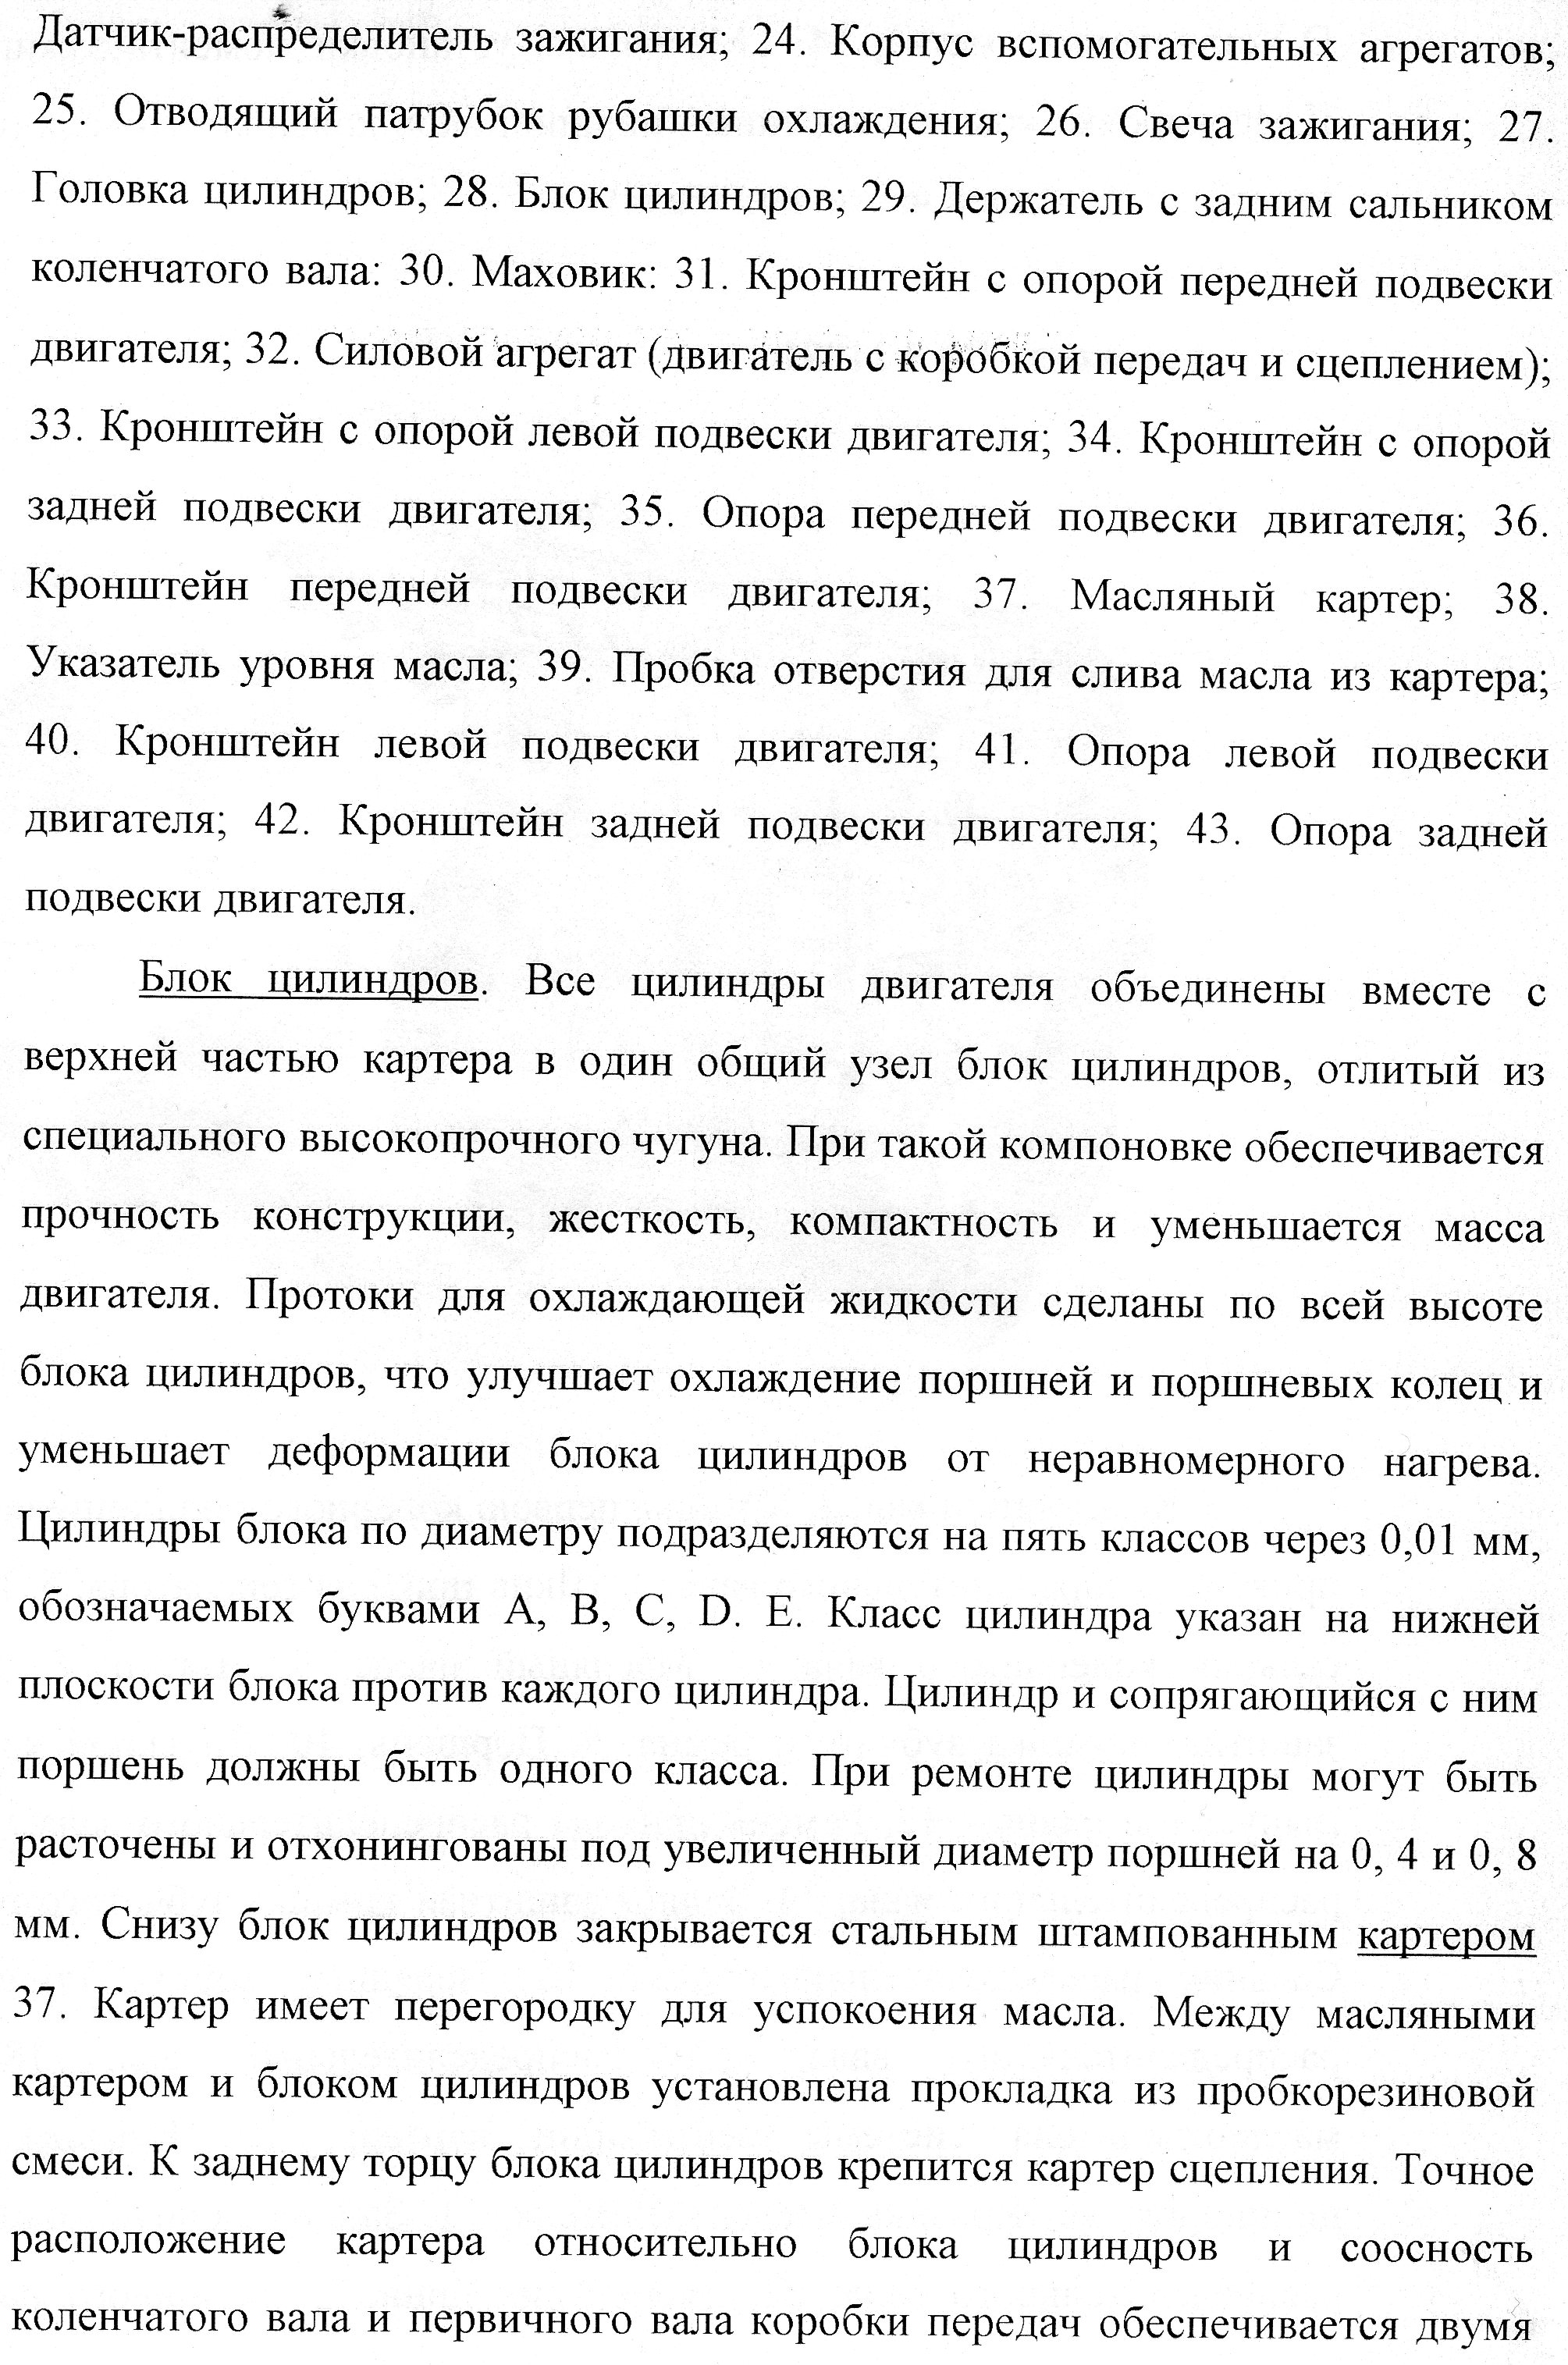 C:\Users\Василий Мельченко\Pictures\img599.jpg